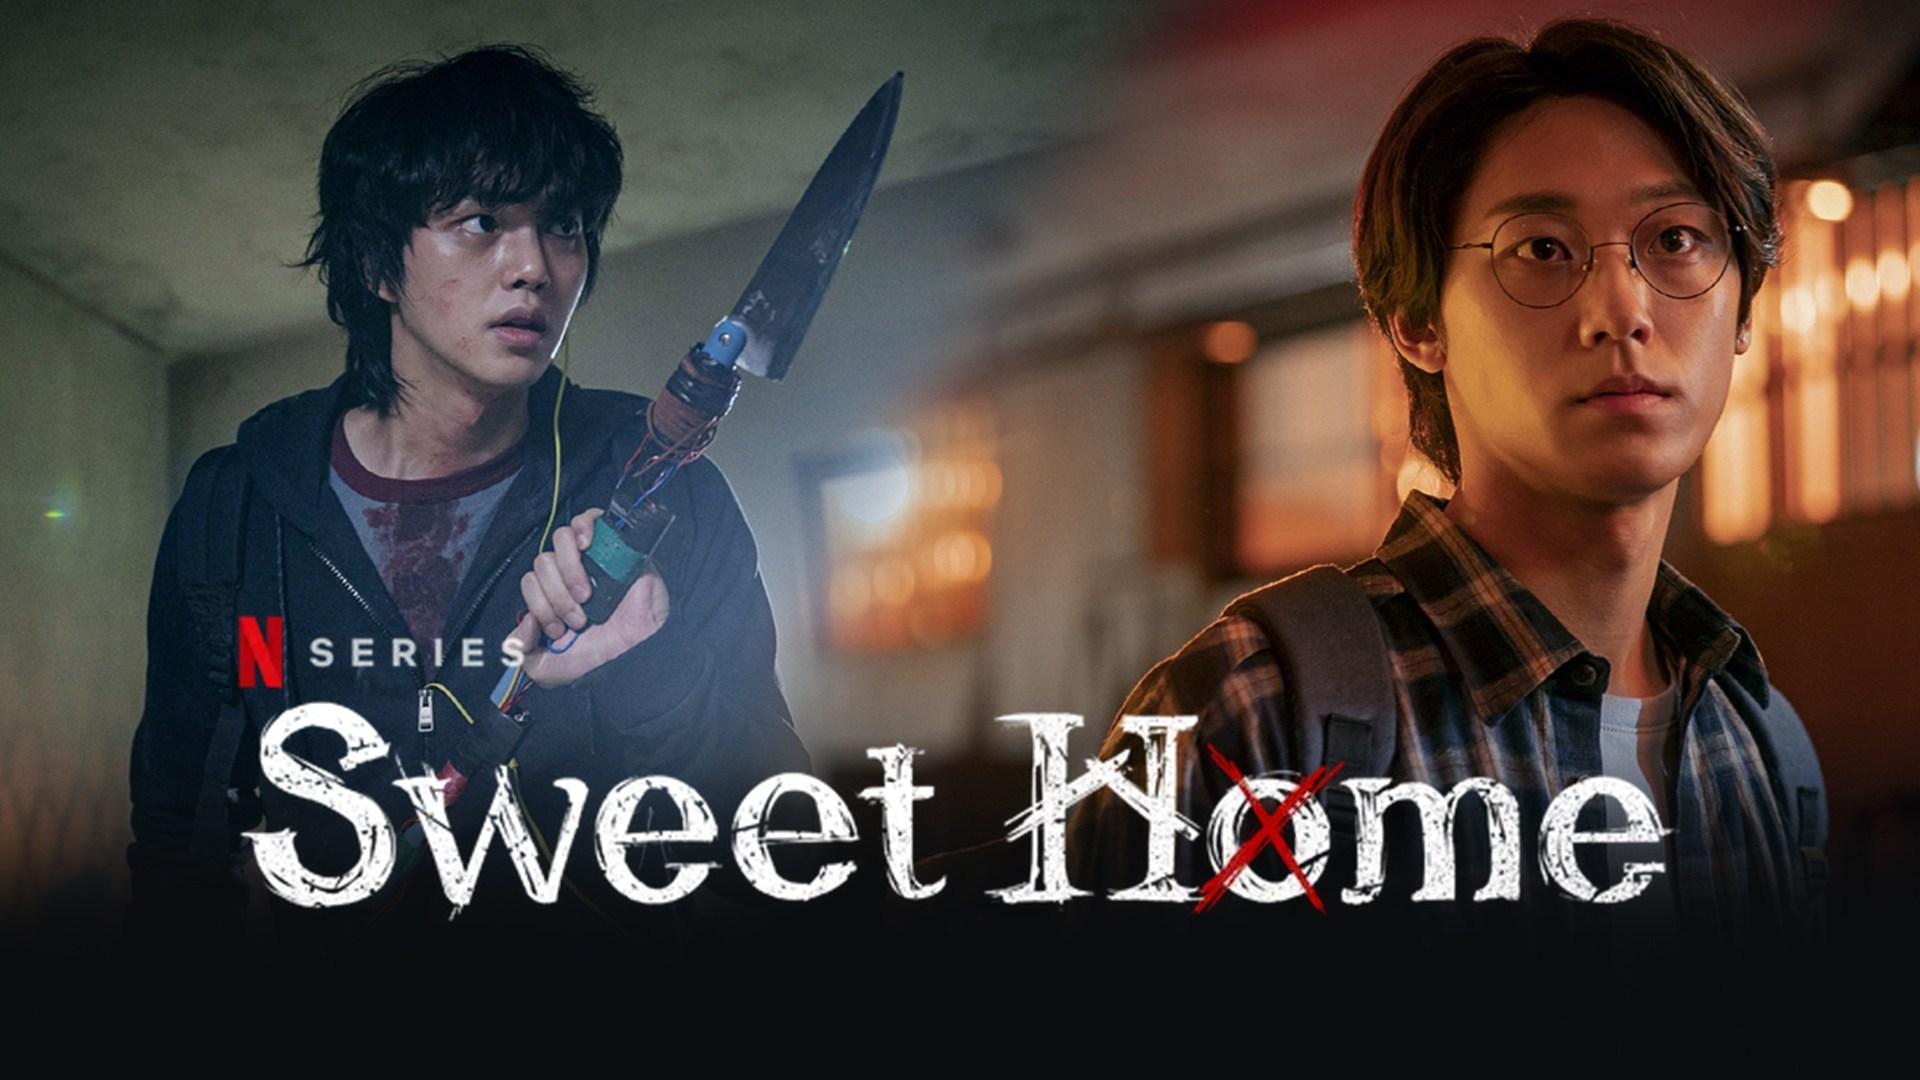 poster kdrama sweet home Netflix